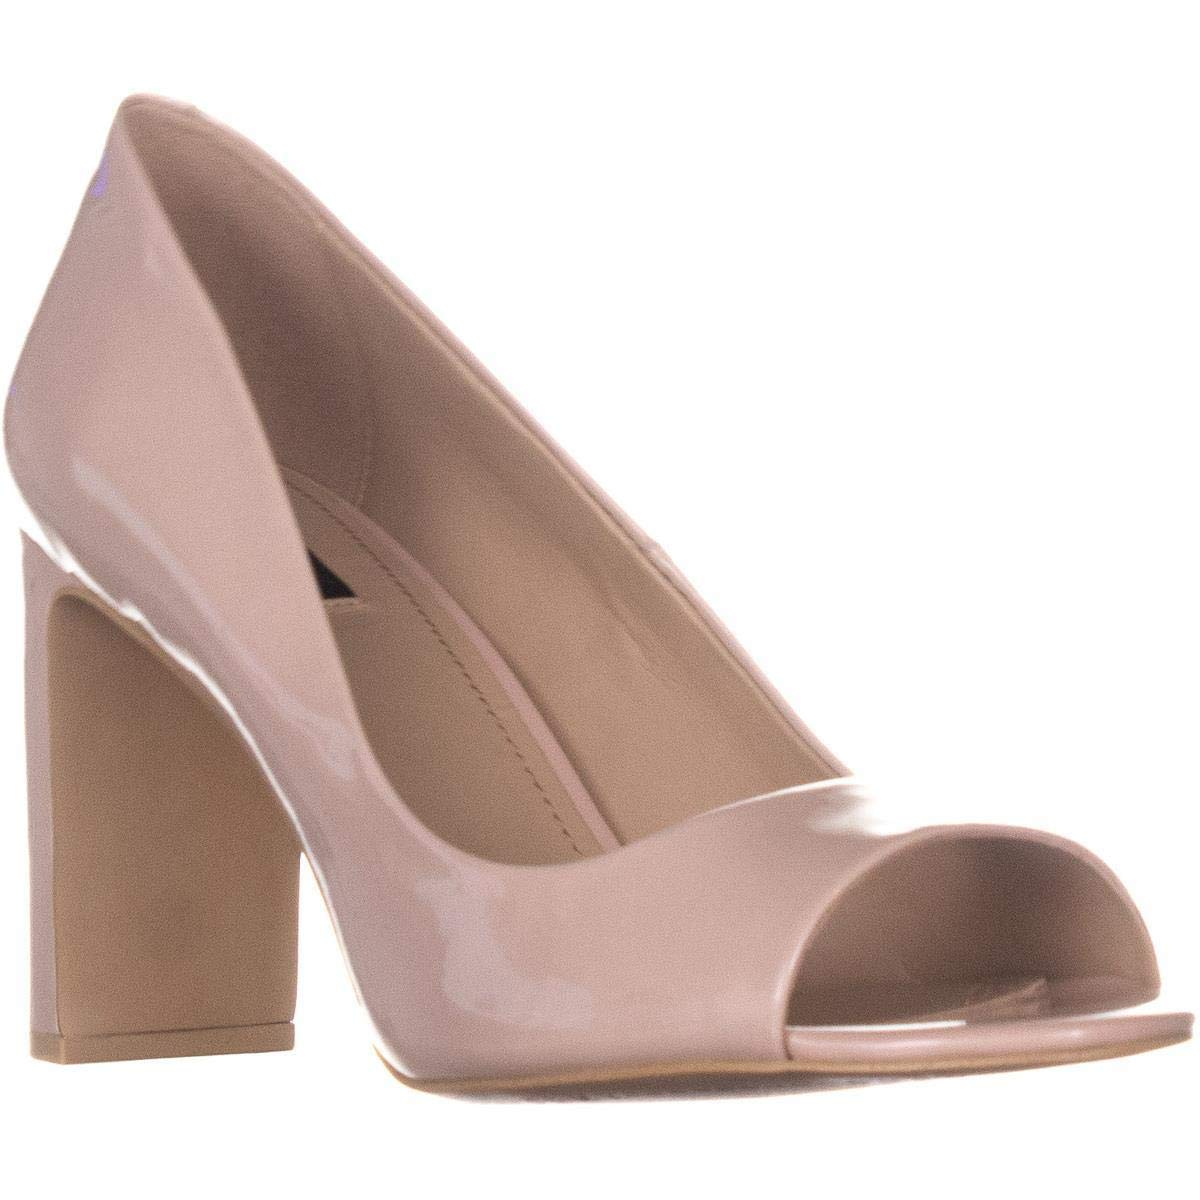 Pinky Patent Leather DKNY Jade Peep Toe Heels, White